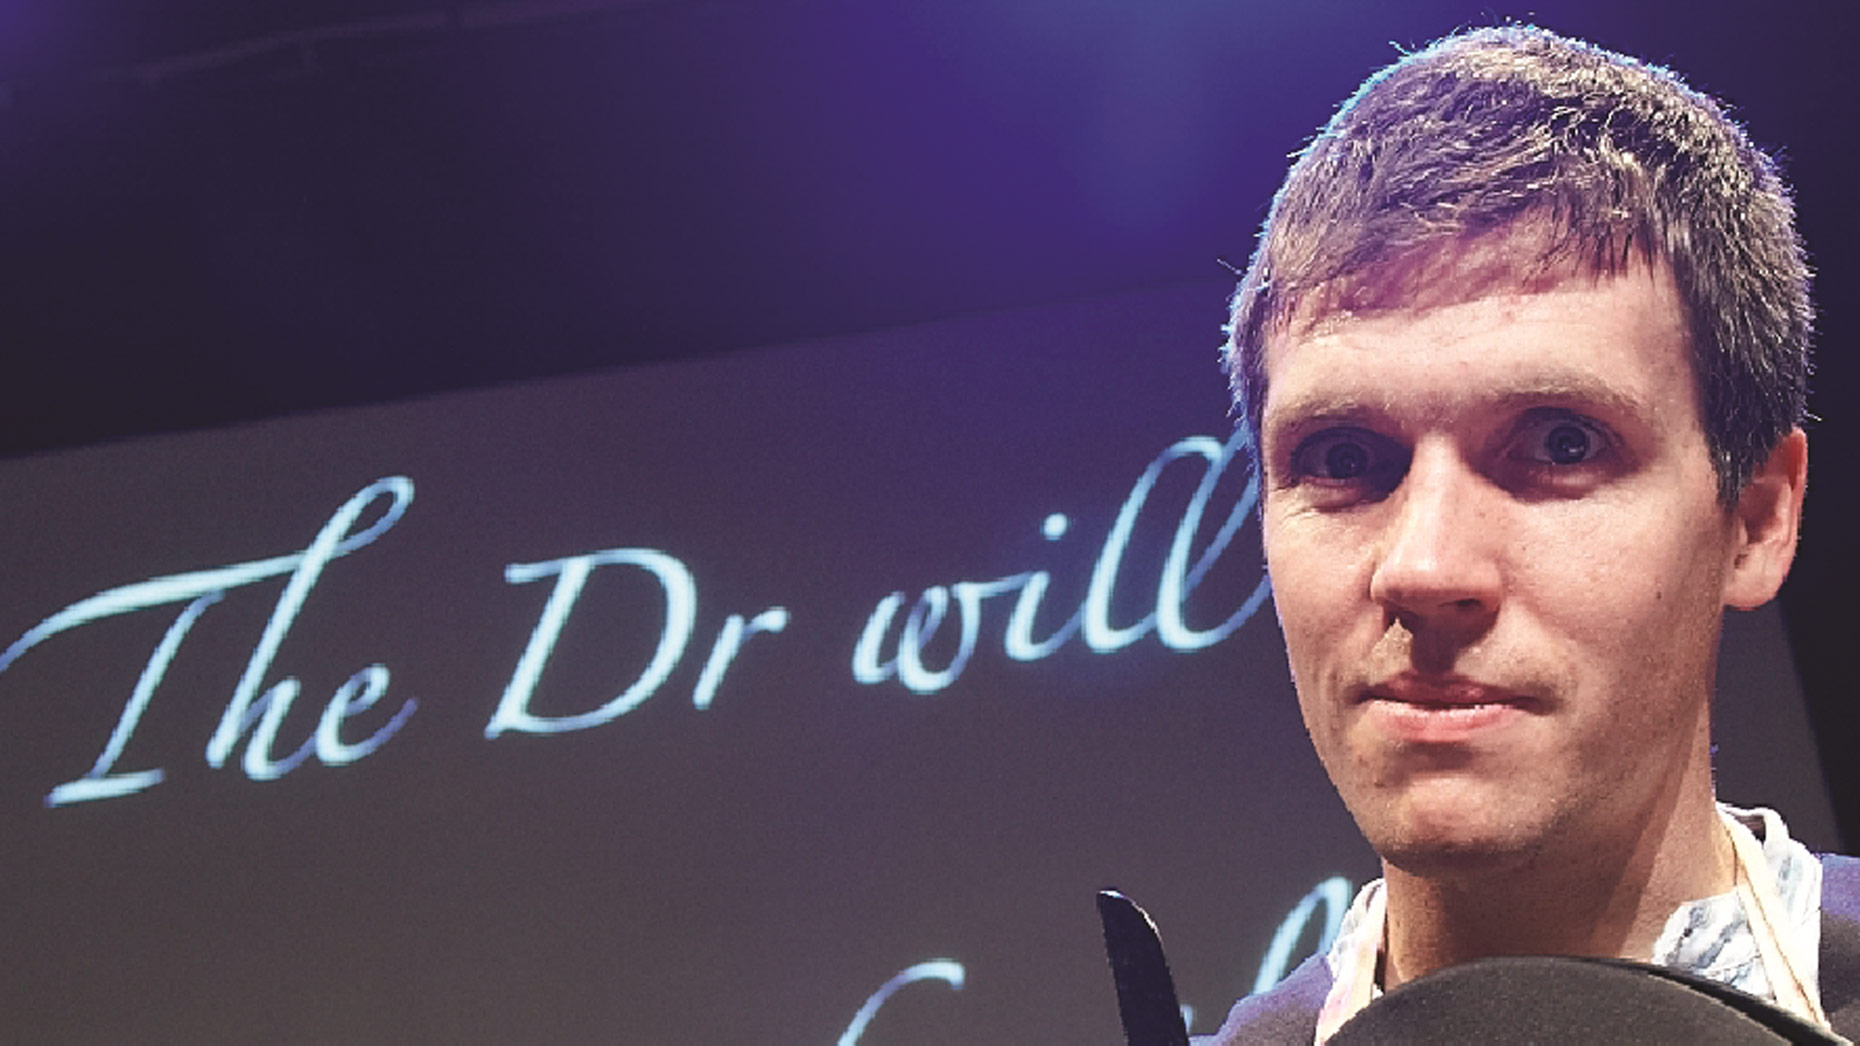 Simon Watt, also known as Dr Death. Photo: Gravity Fields